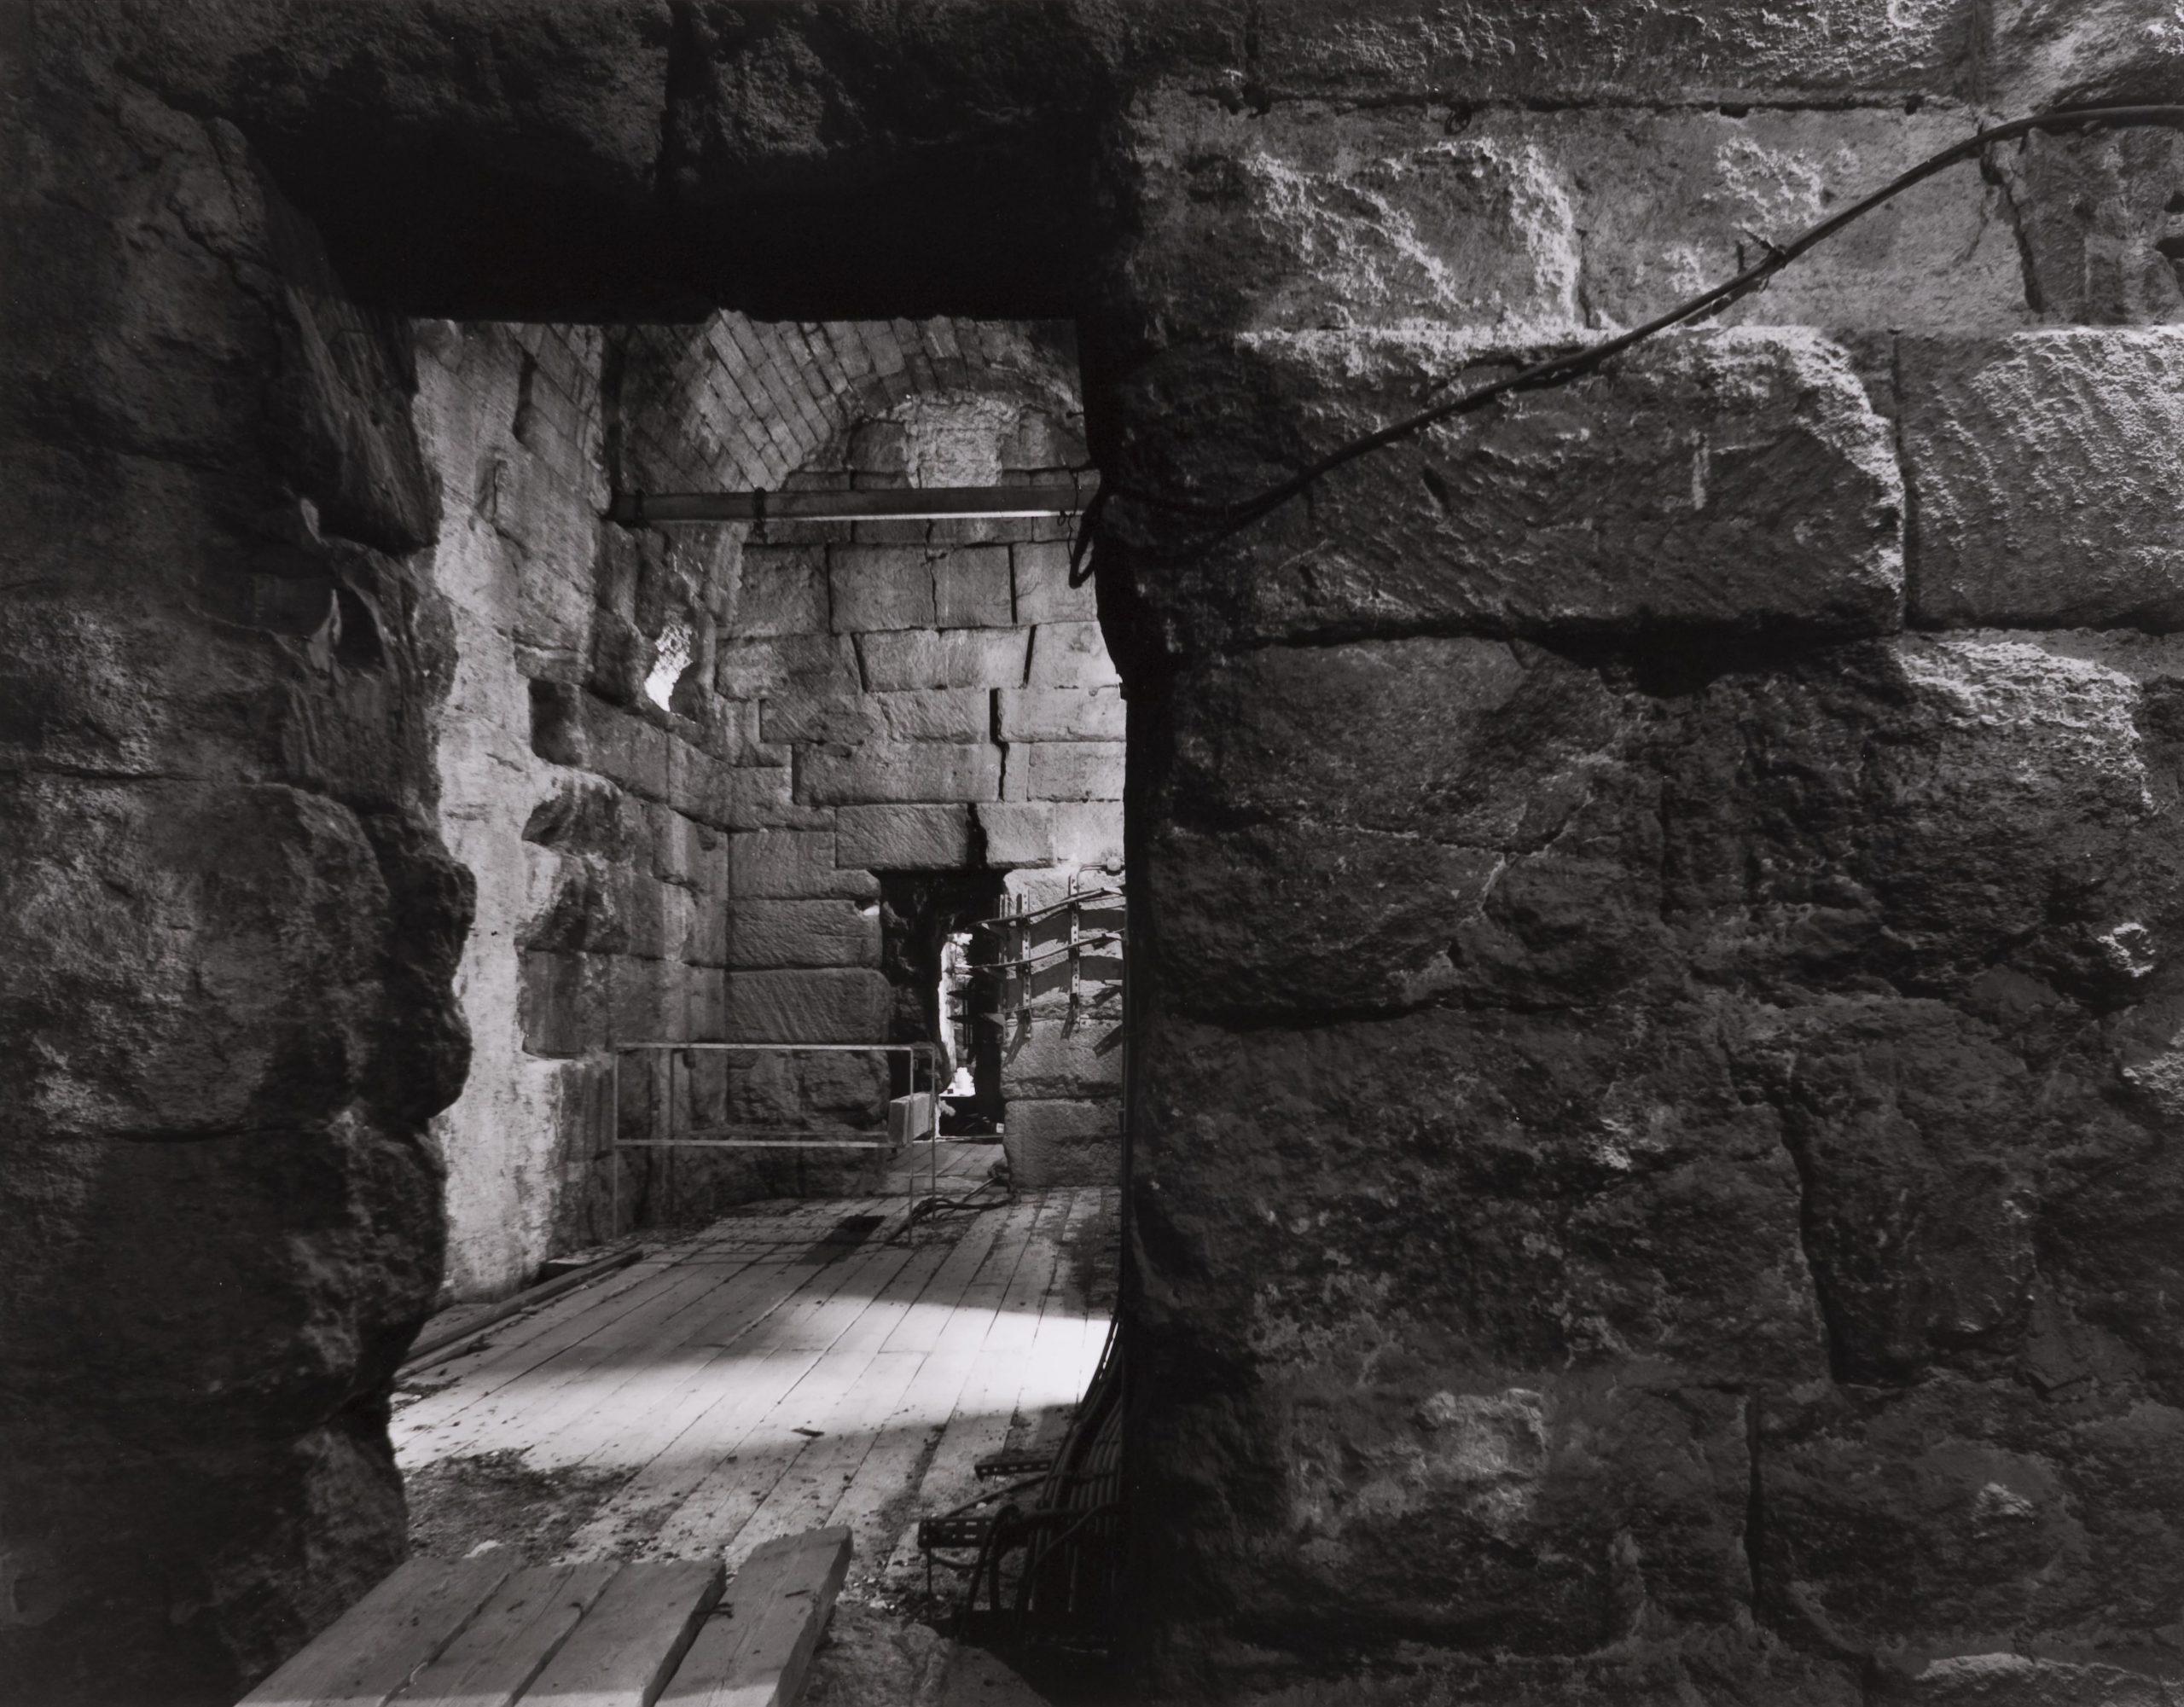 Basilico, Gabriele 22